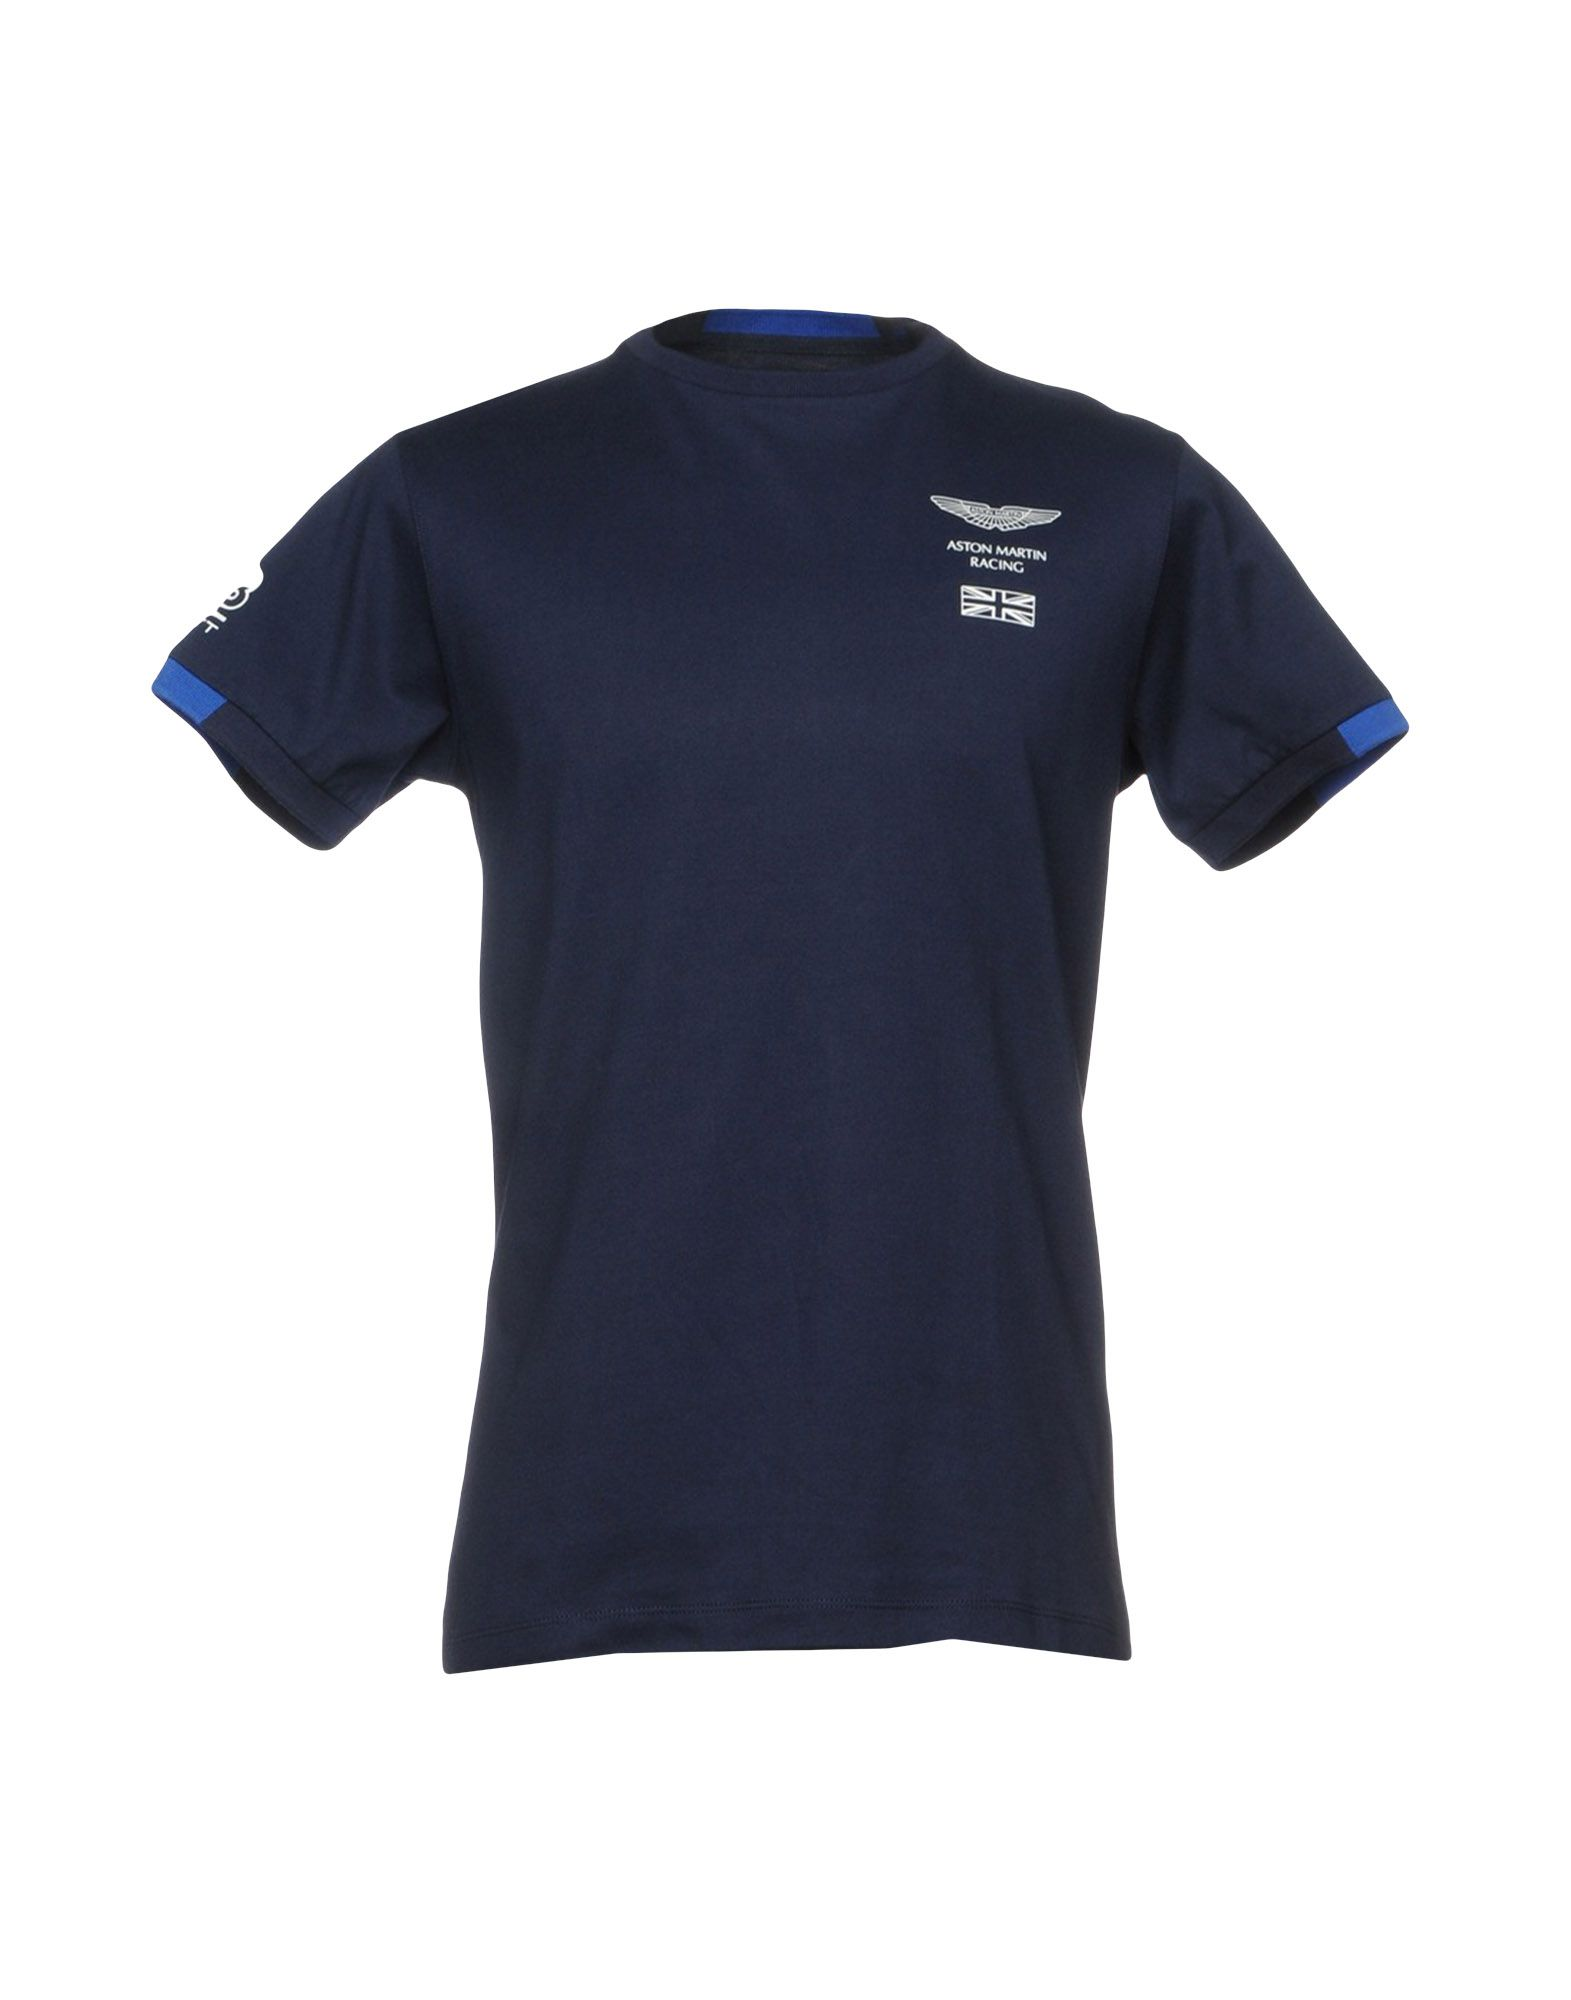 ASTON MARTIN RACING by HACKETT T-shirts